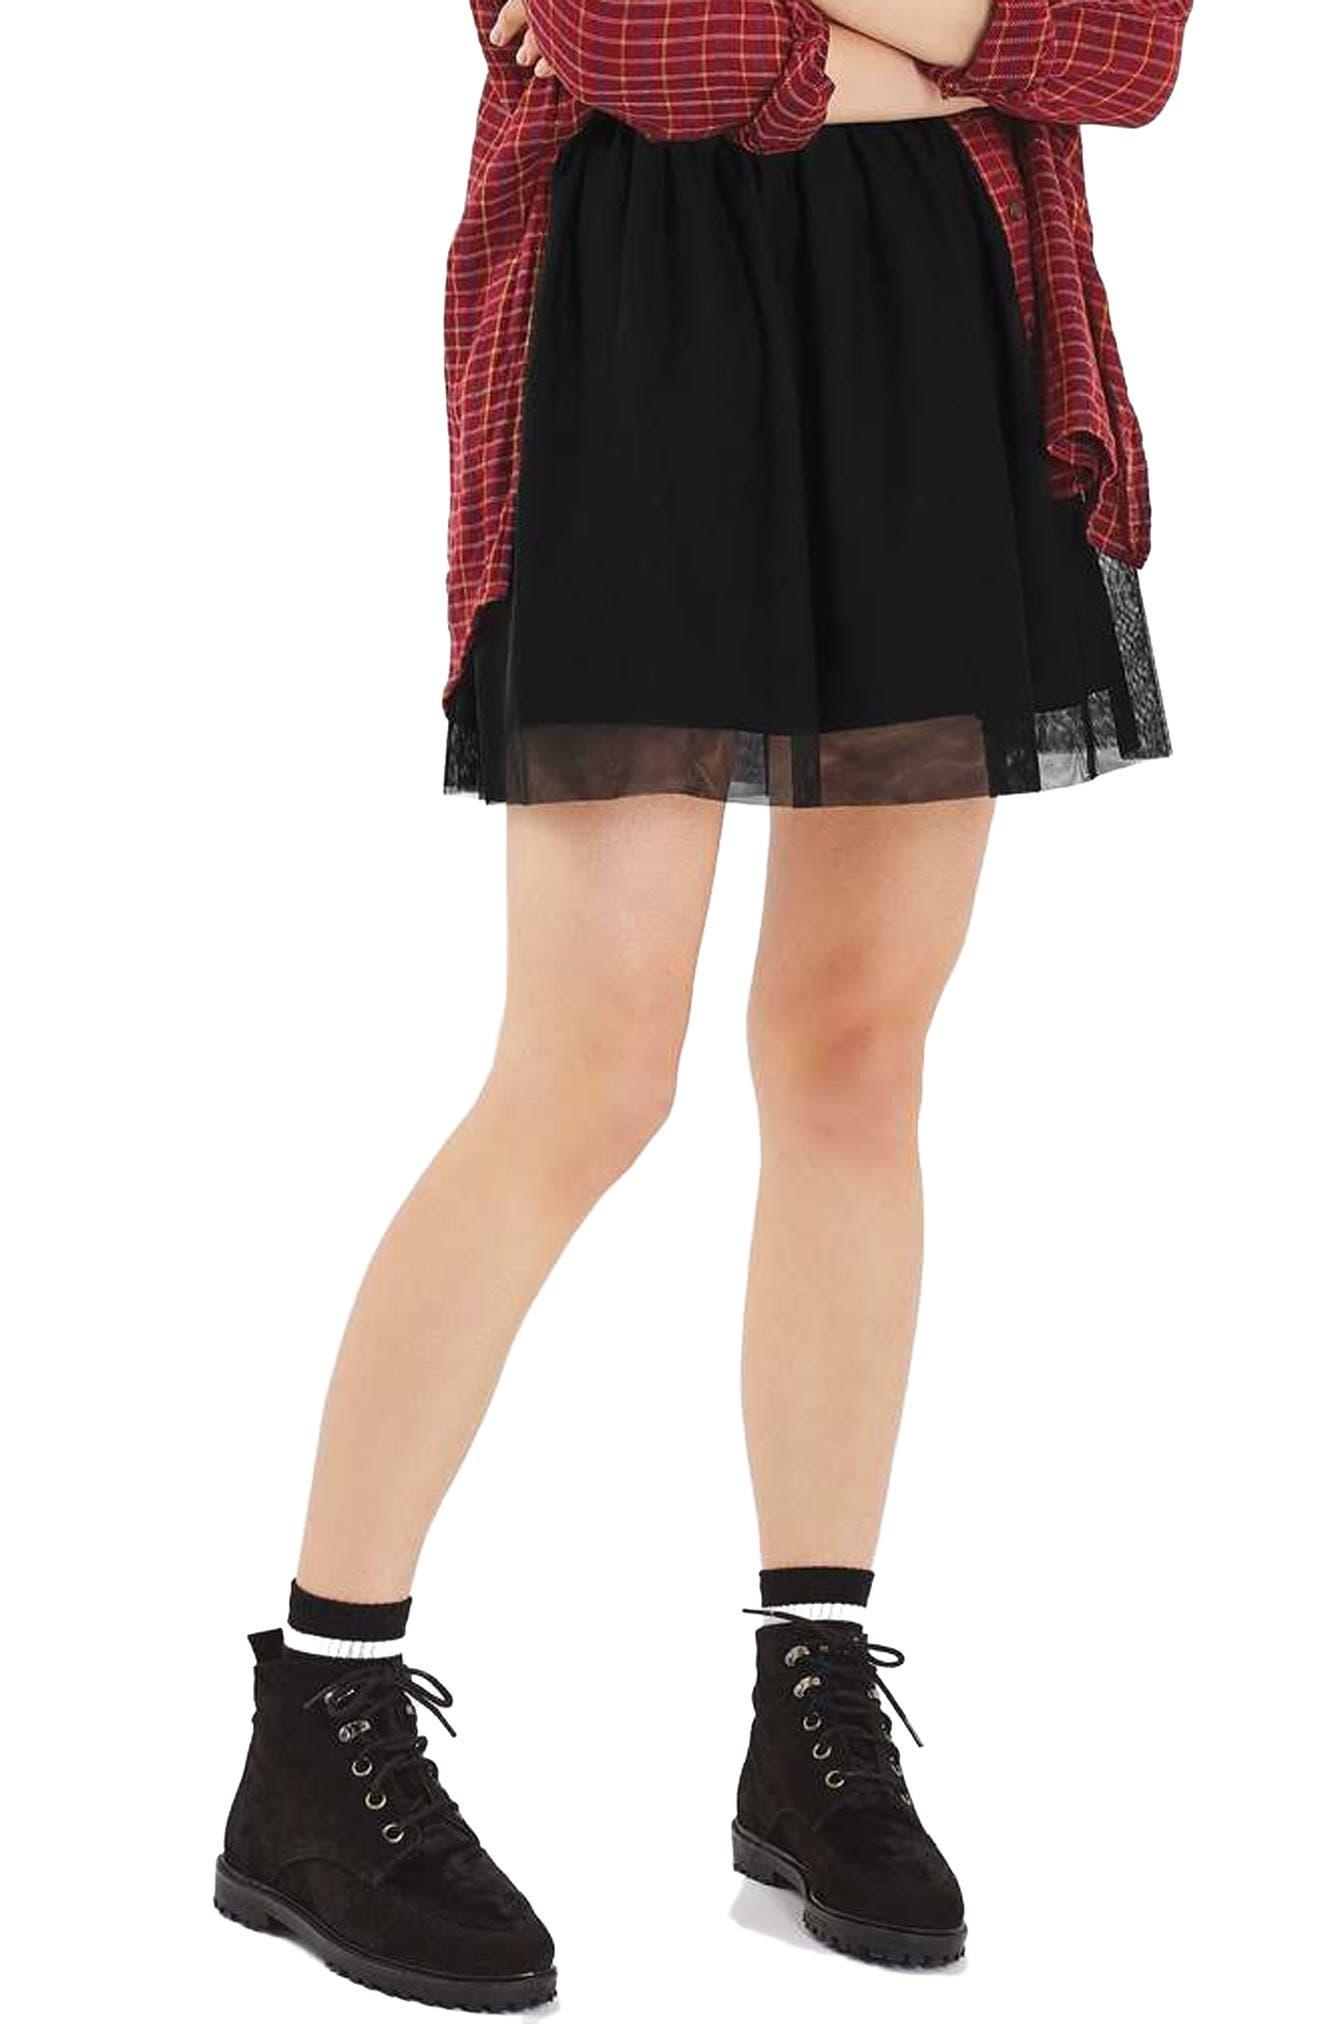 TOPSHOP Tulle Miniskirt, Main, color, 001